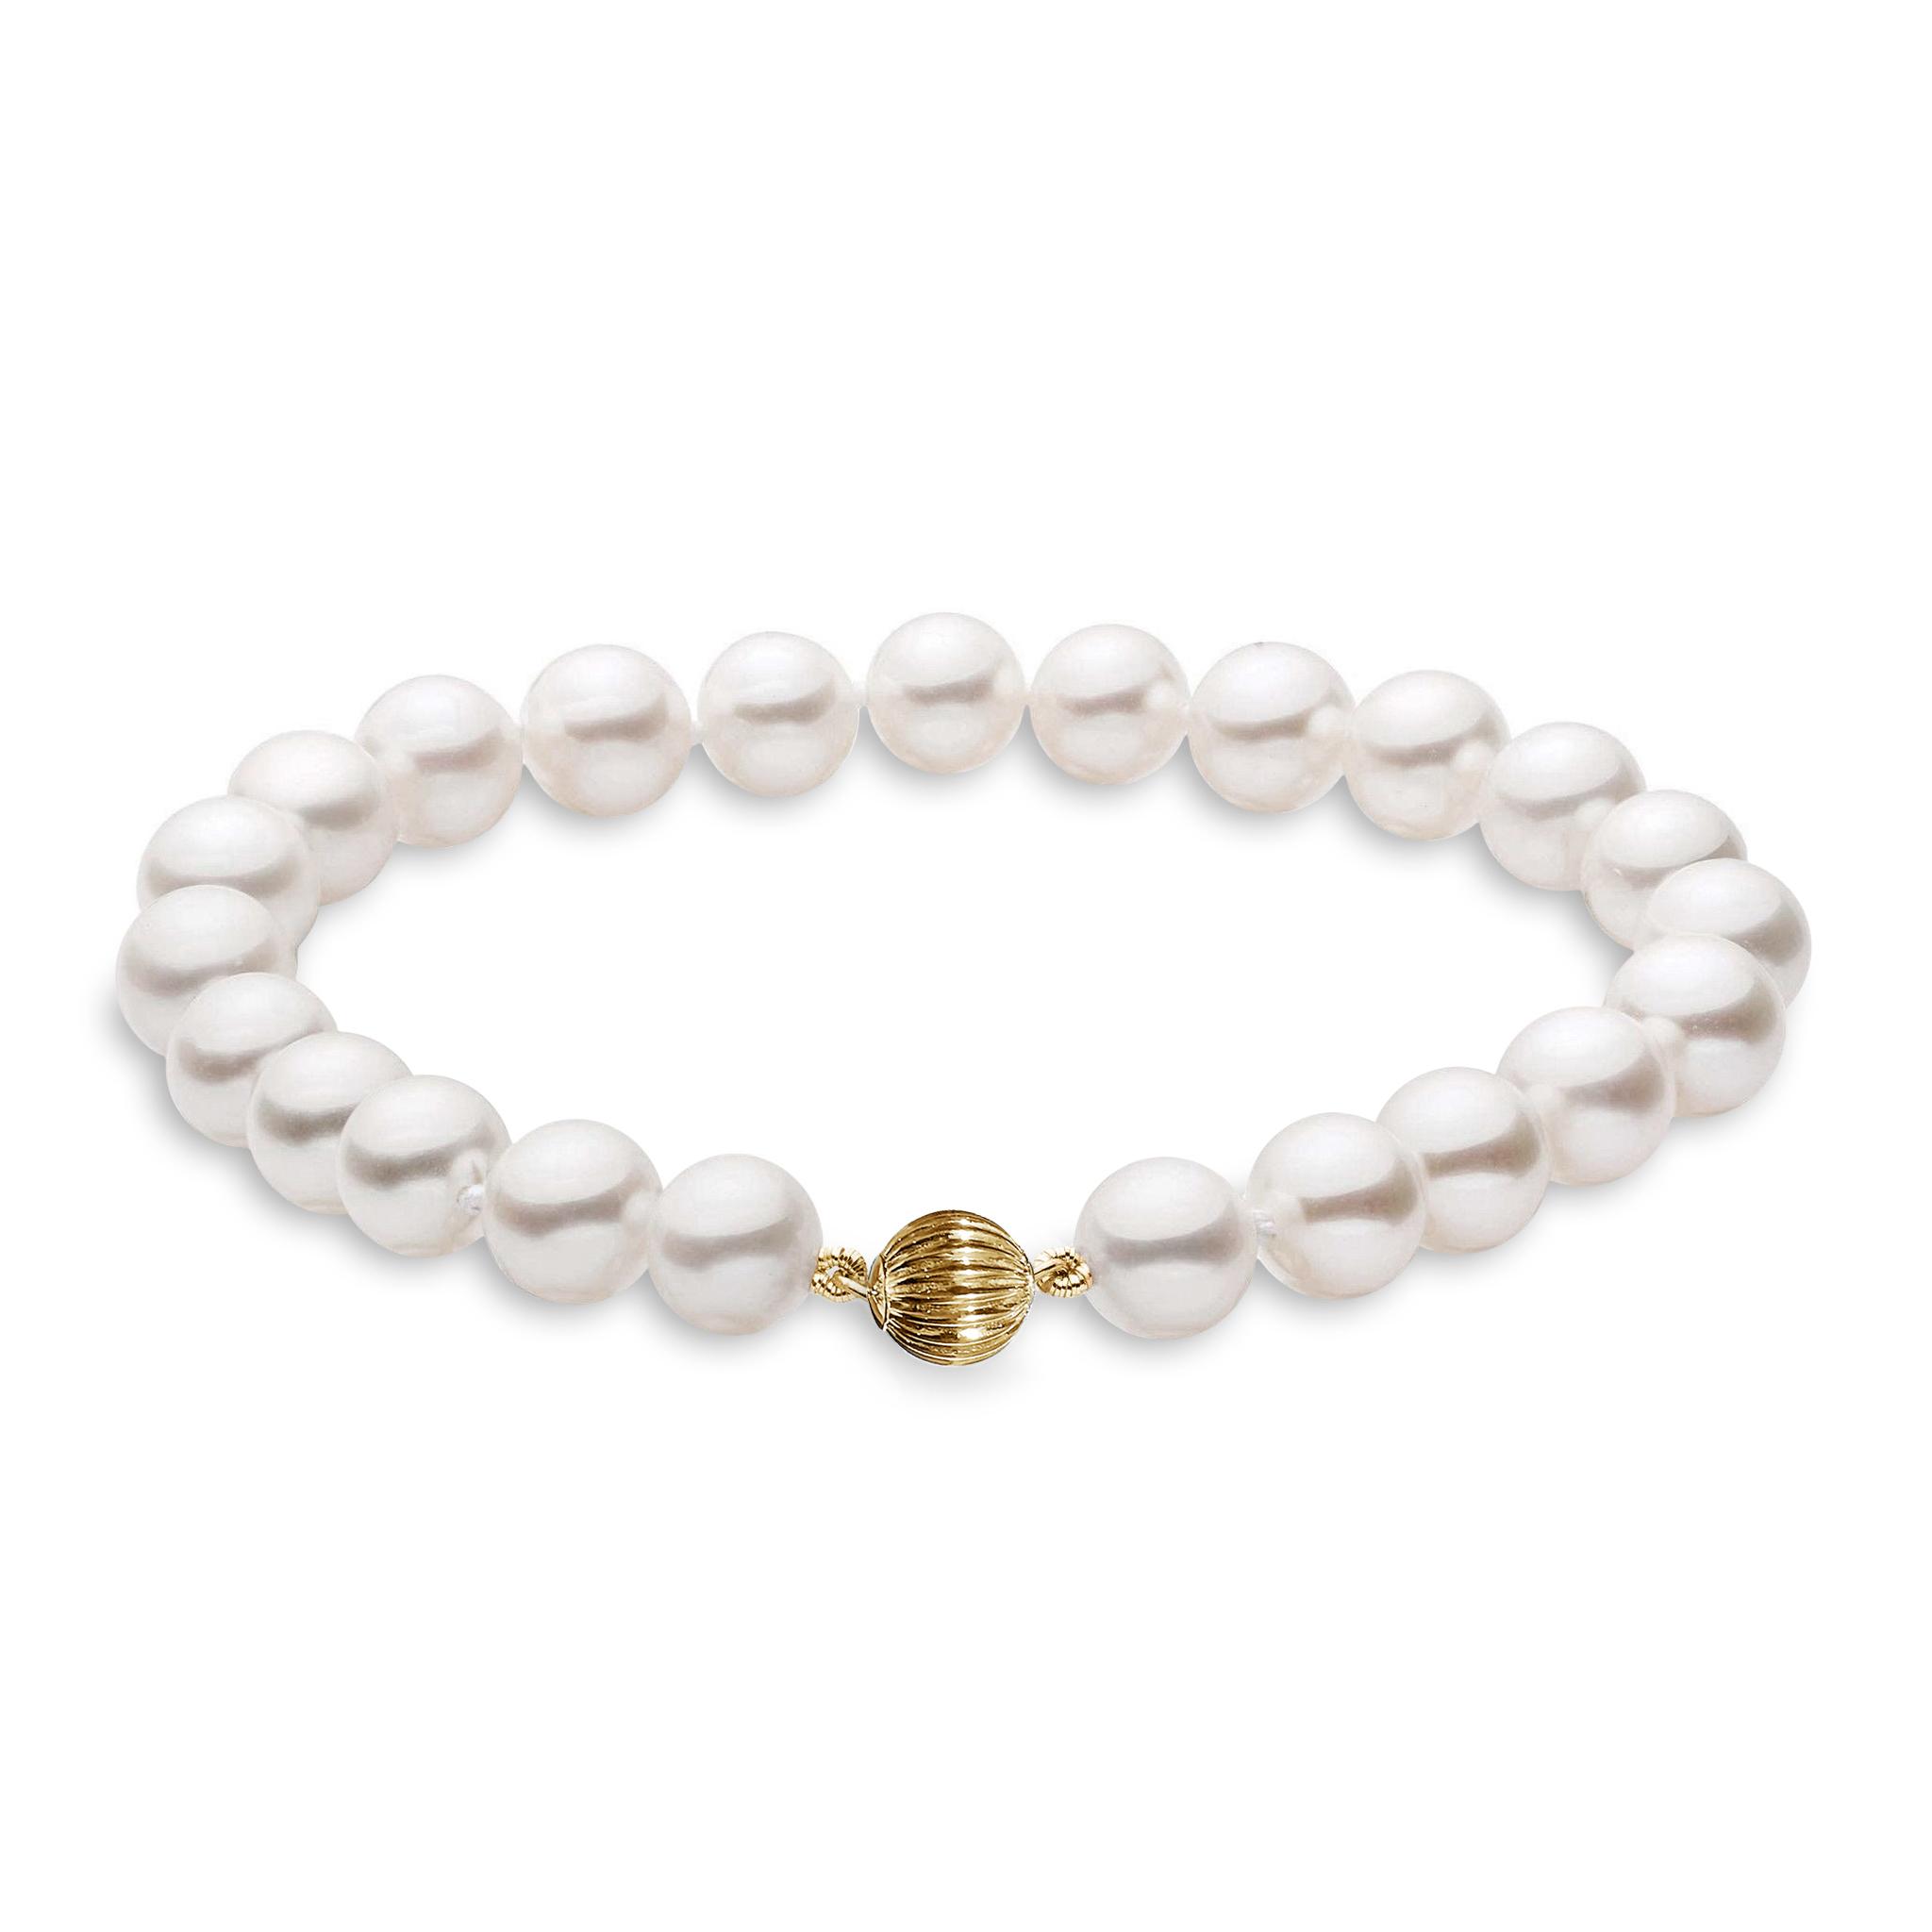 B011 – Akoya Pearls